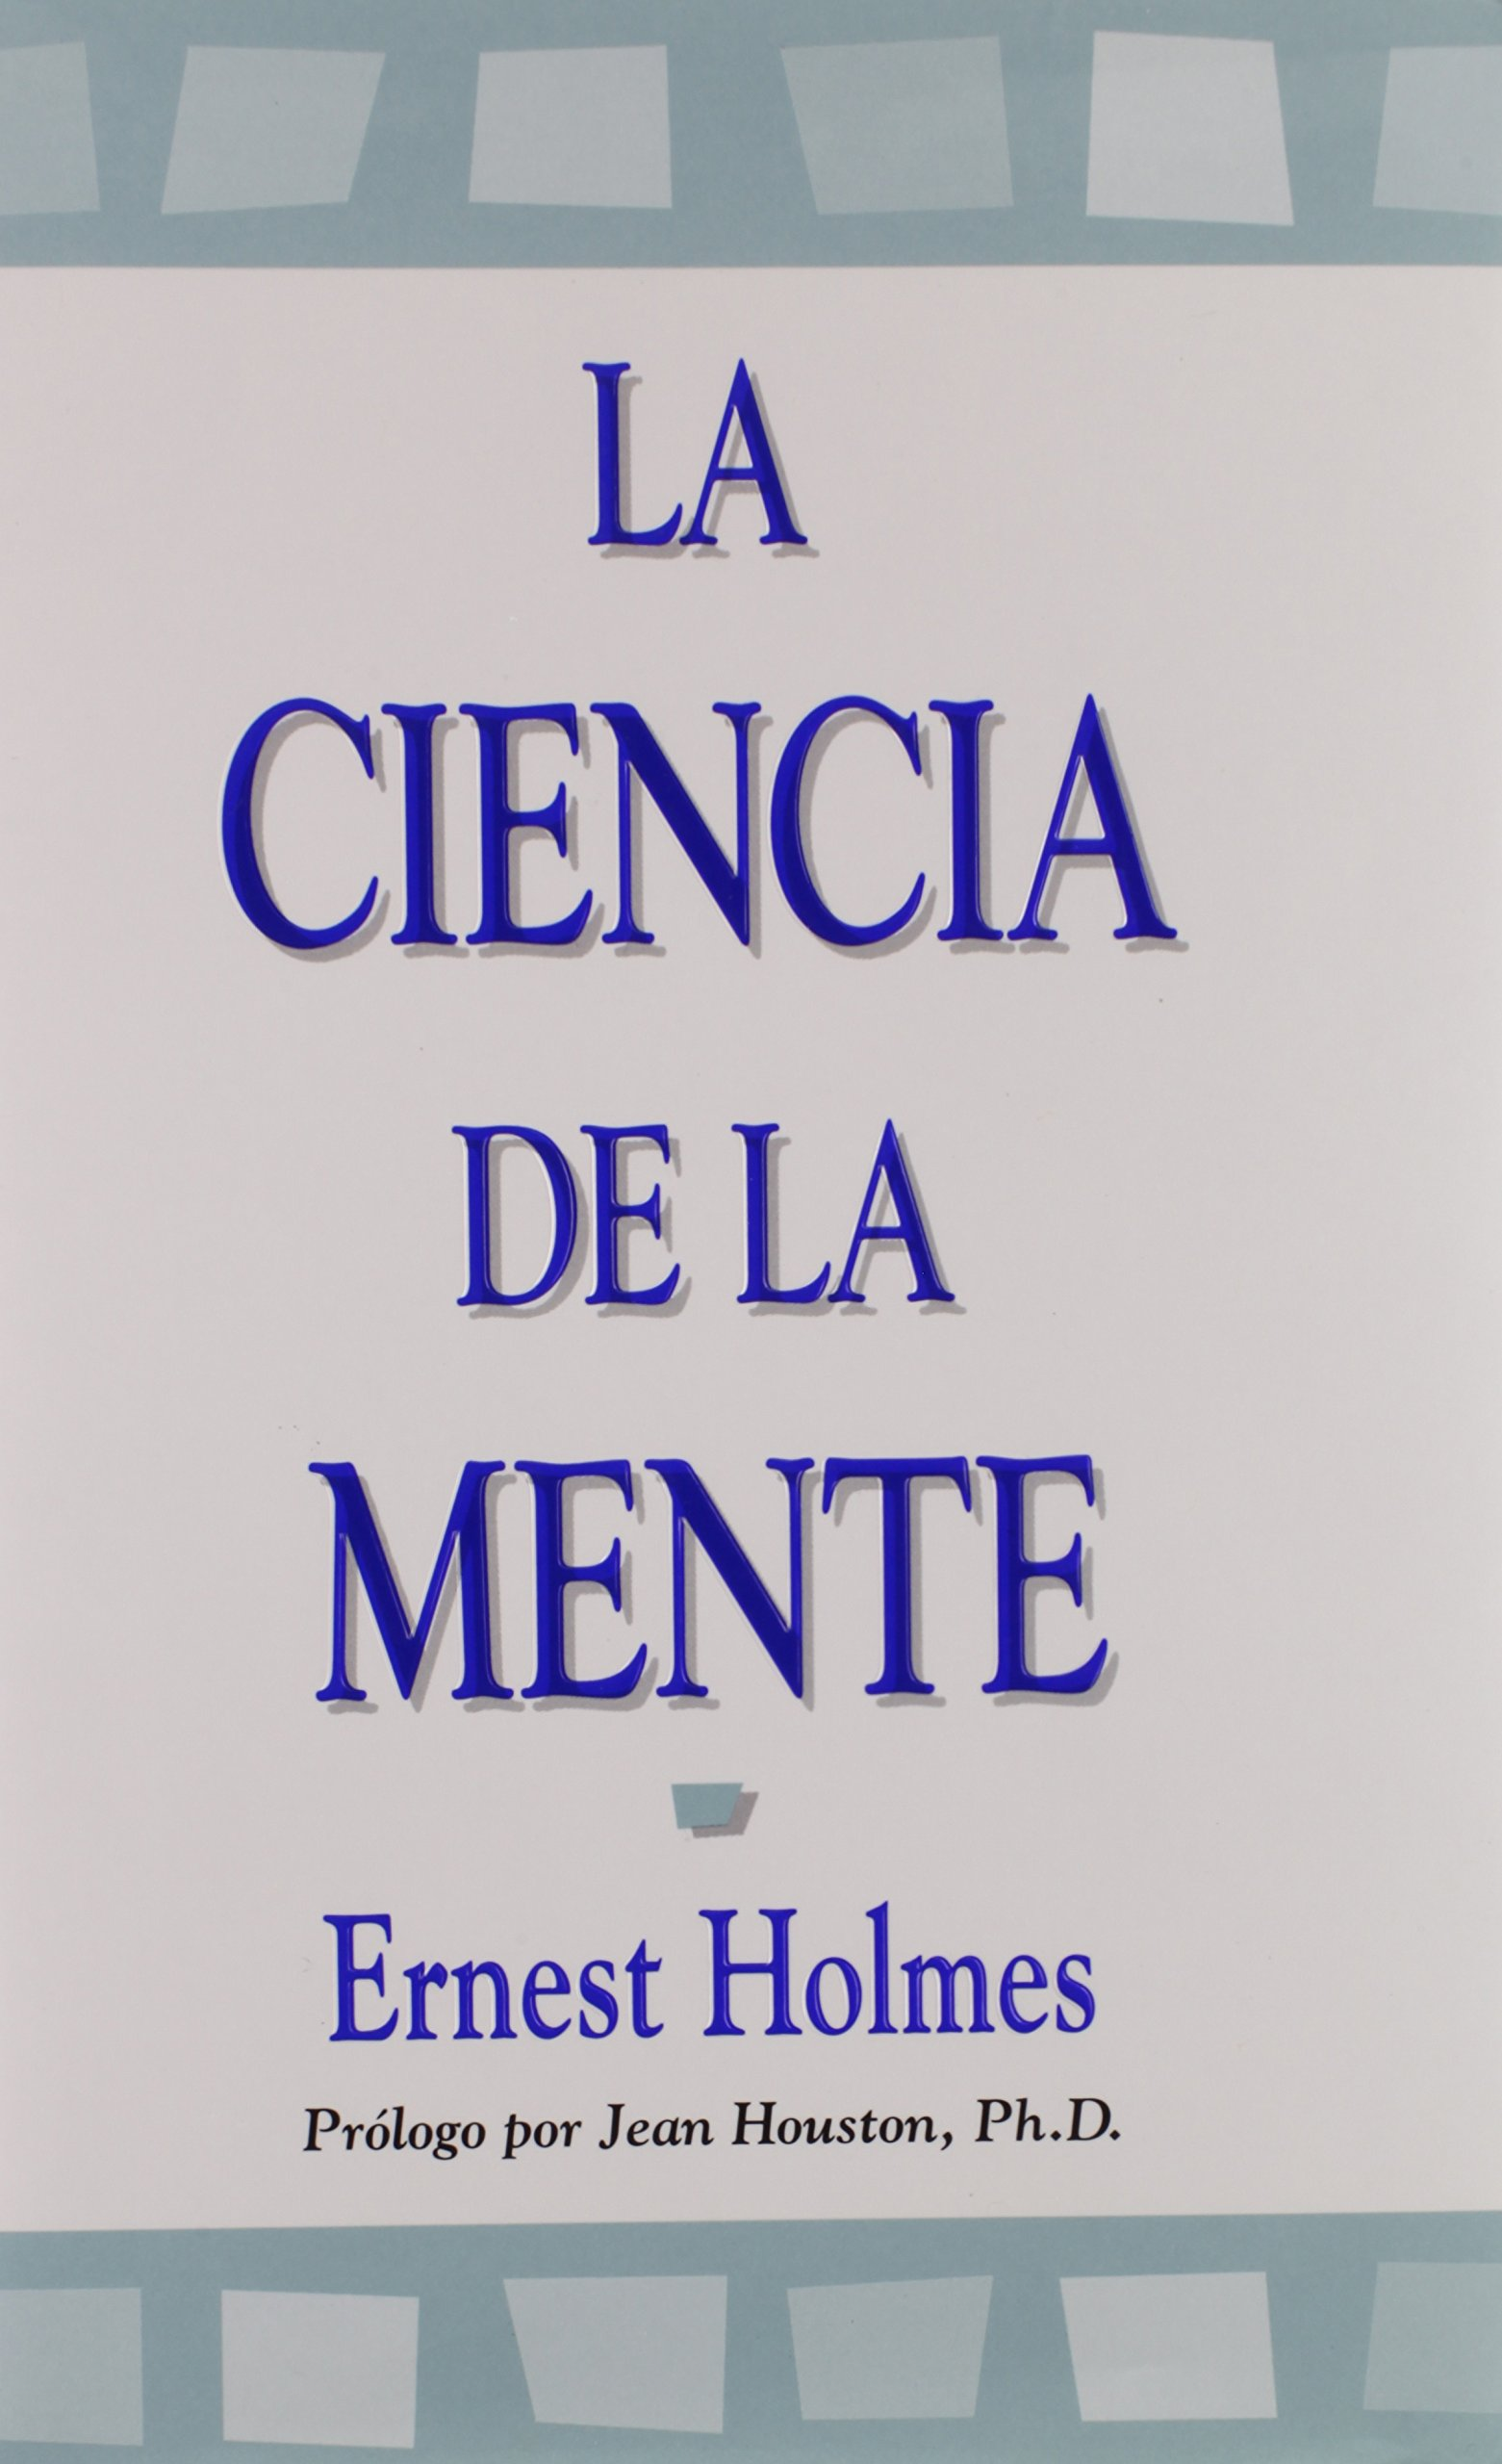 Instituto Dr. Ernest Holmes, AC